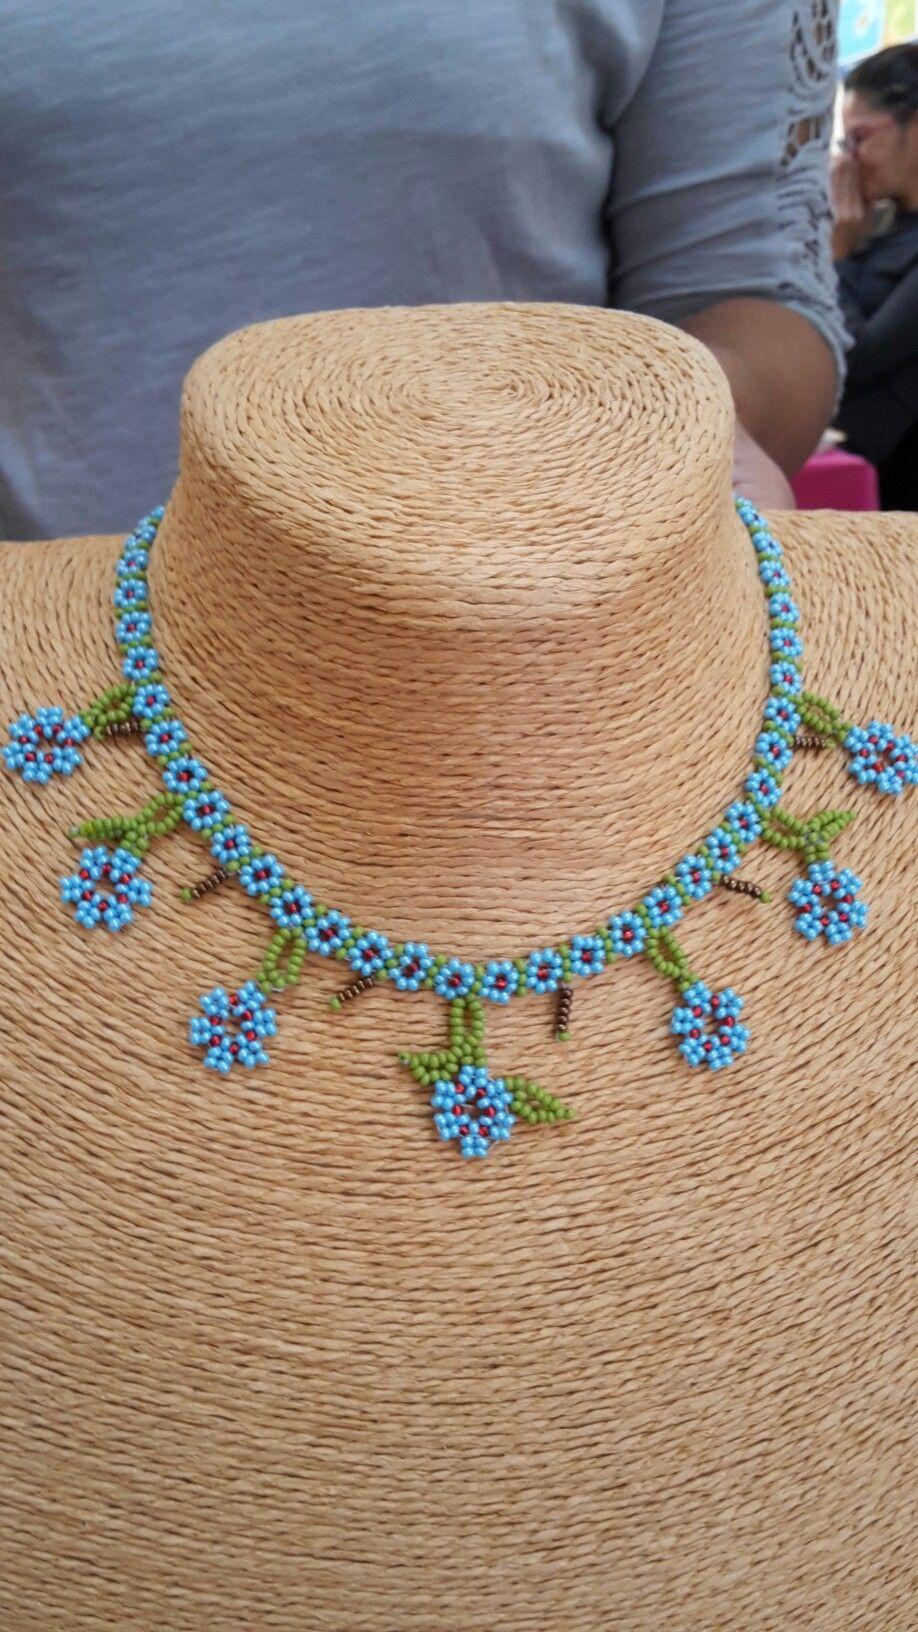 ebc2a62a955b Flowernecklace Collar De Flores